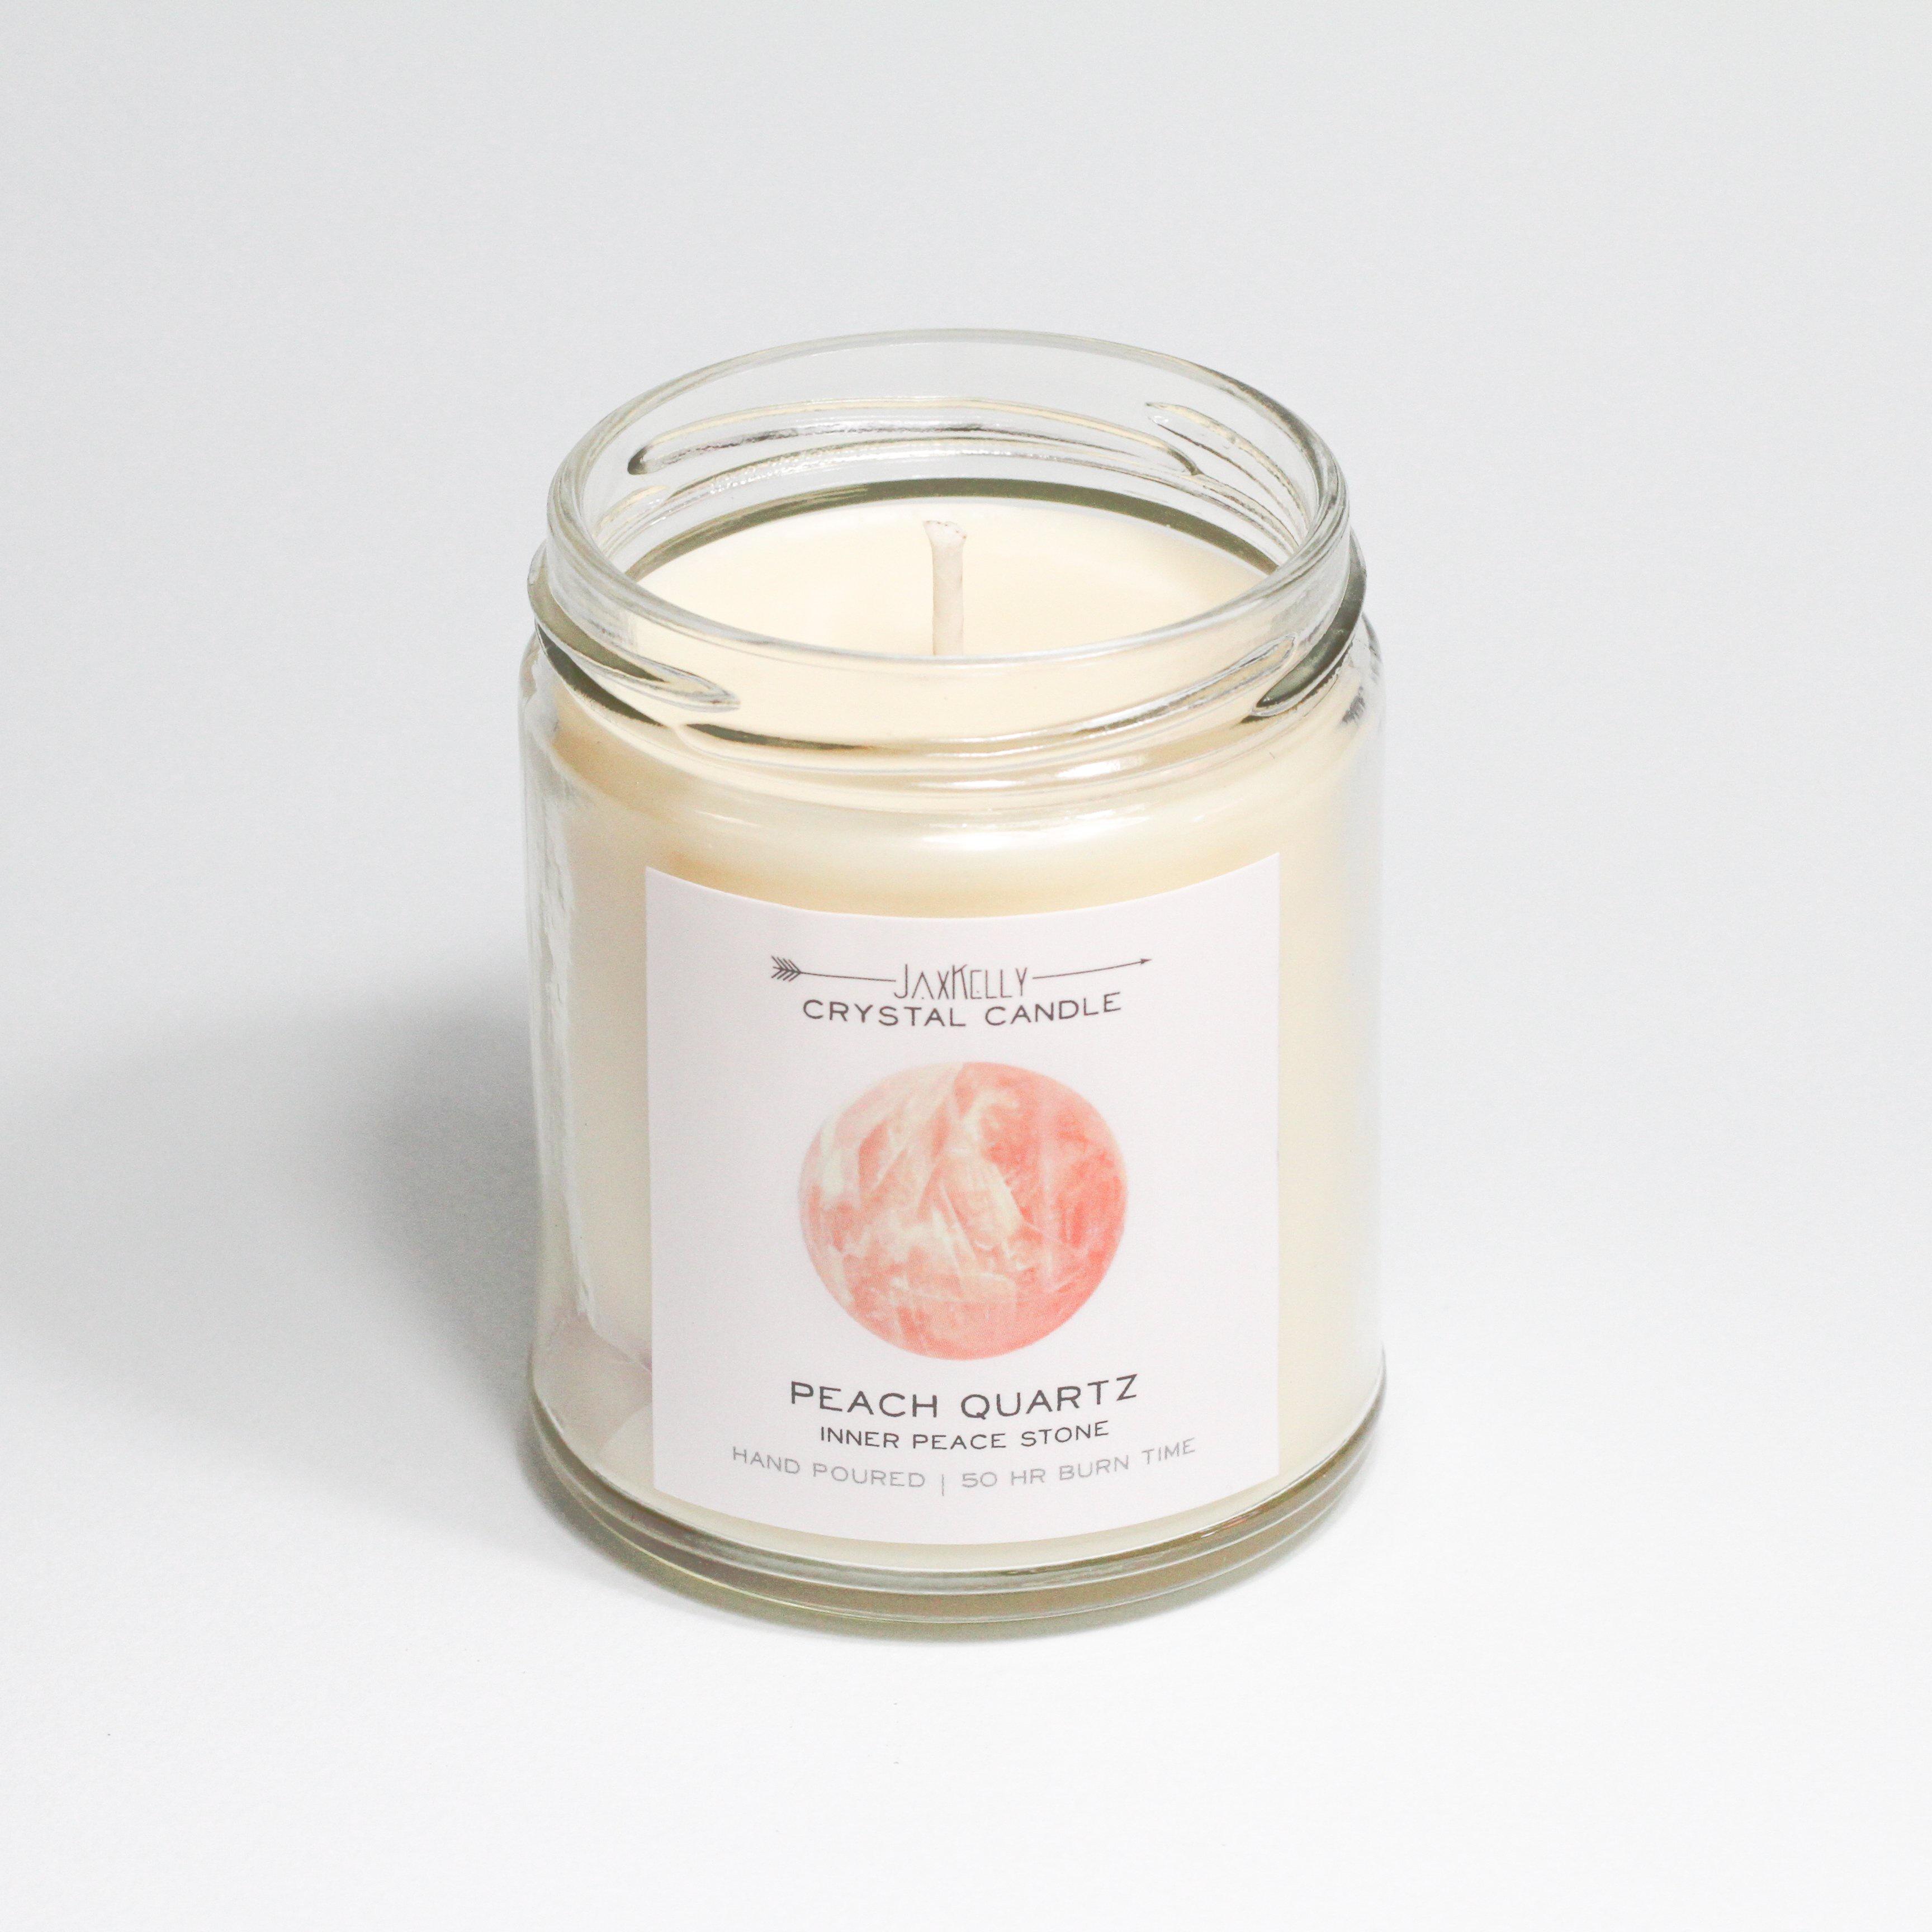 Peach Quartz Crystal Candle - Inner Peace